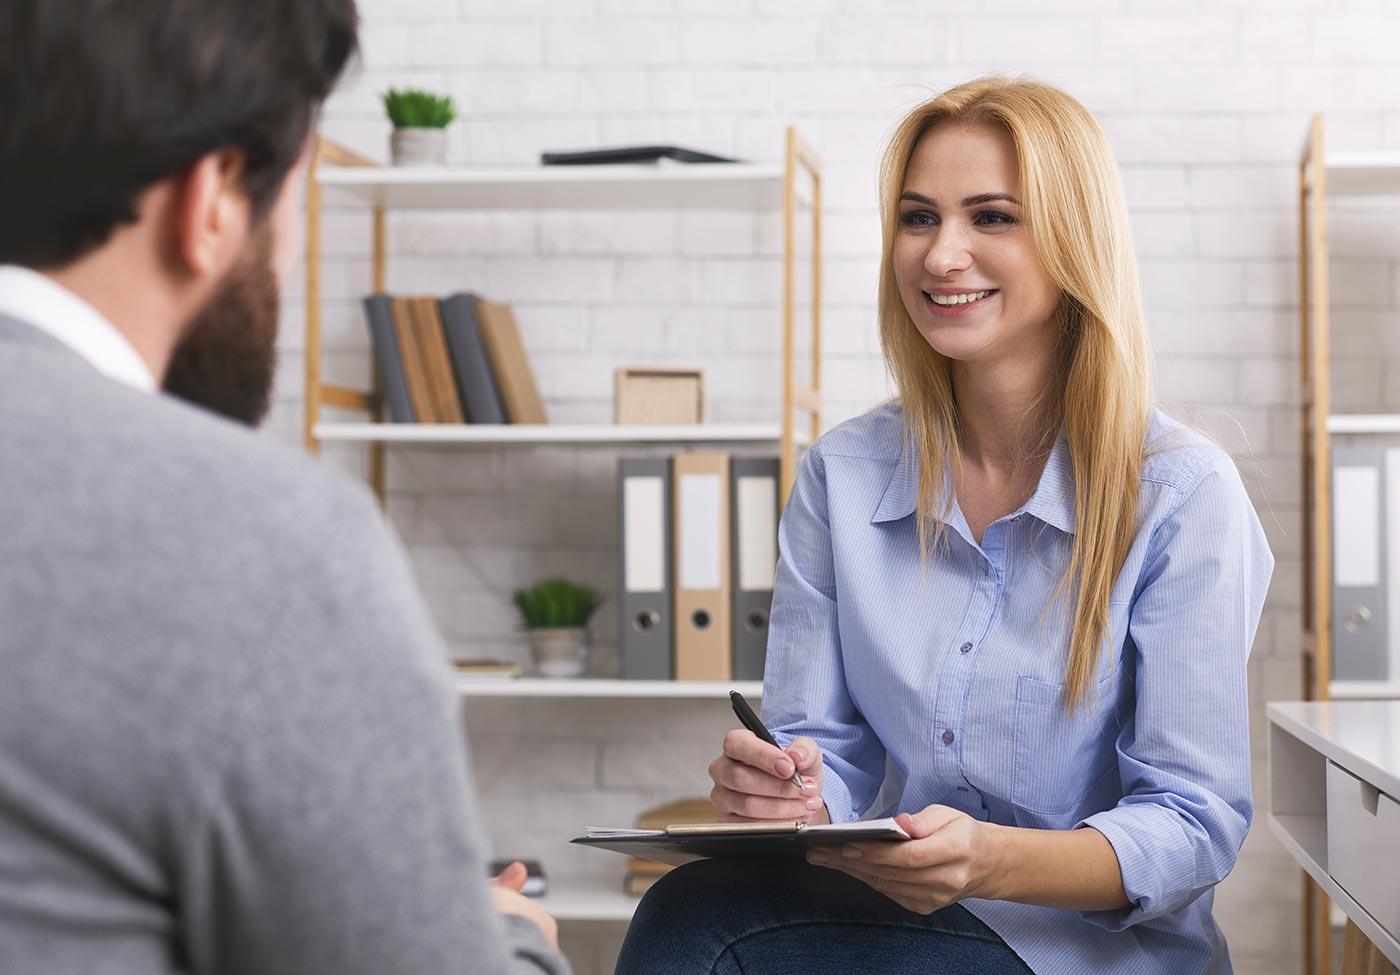 Woman interviews man.